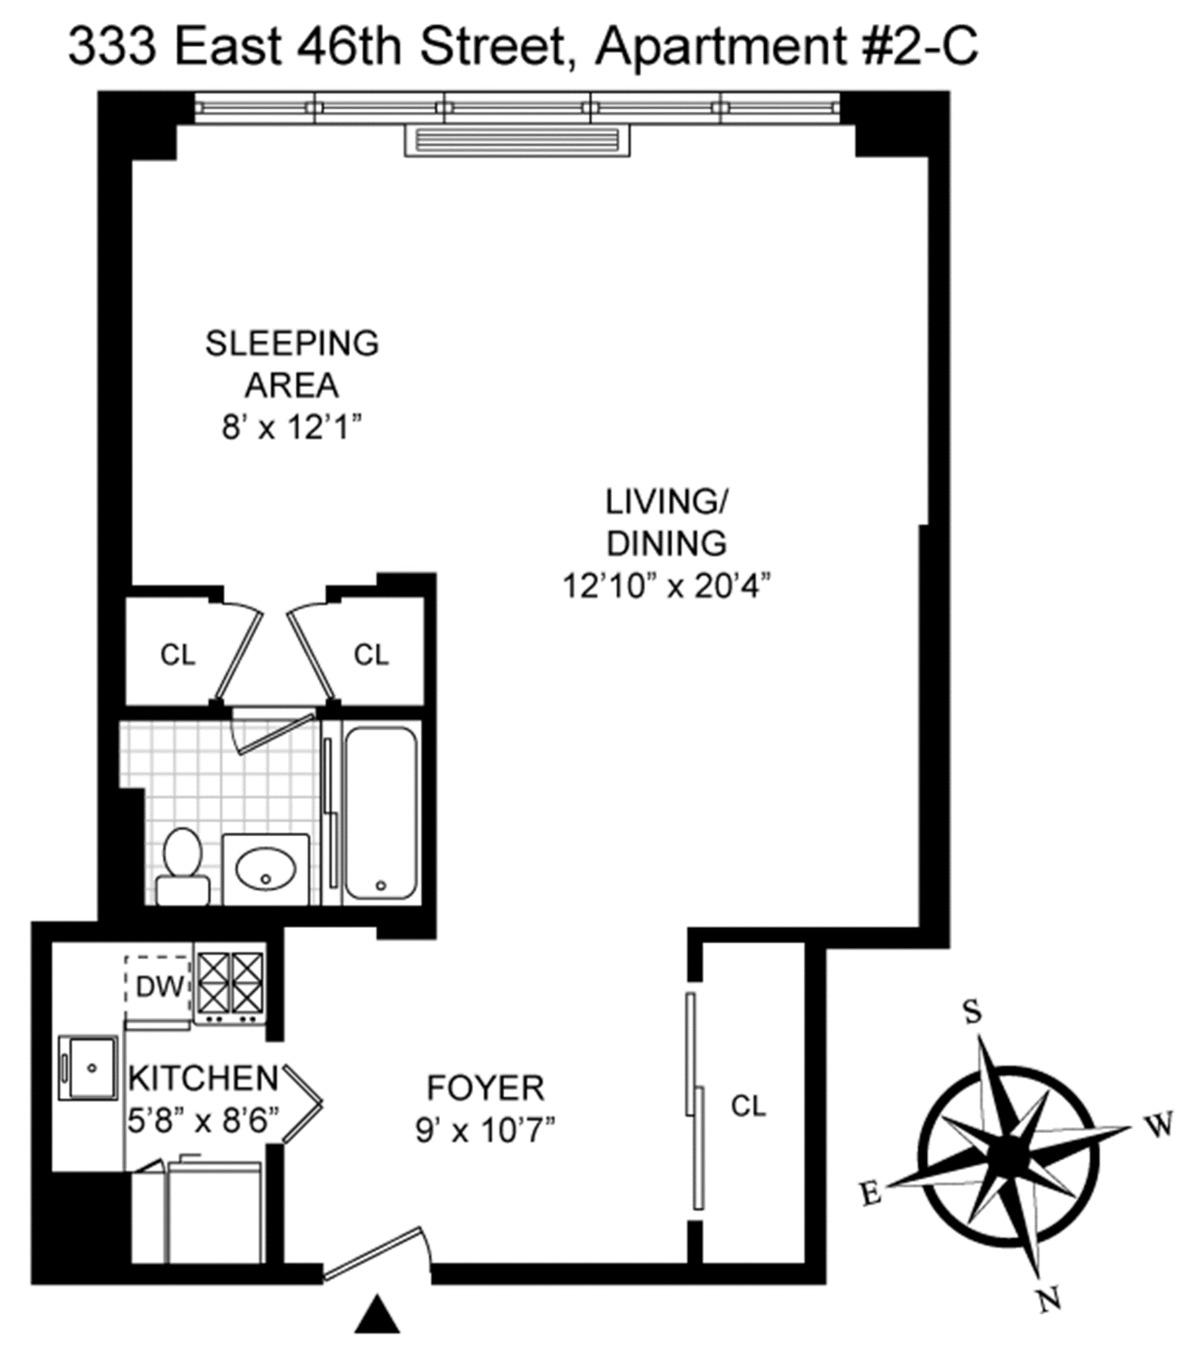 Streeteasy 333 east 46th street in turtle bay 2c for 1 dag hammarskjold plaza 7th floor new york ny 10017